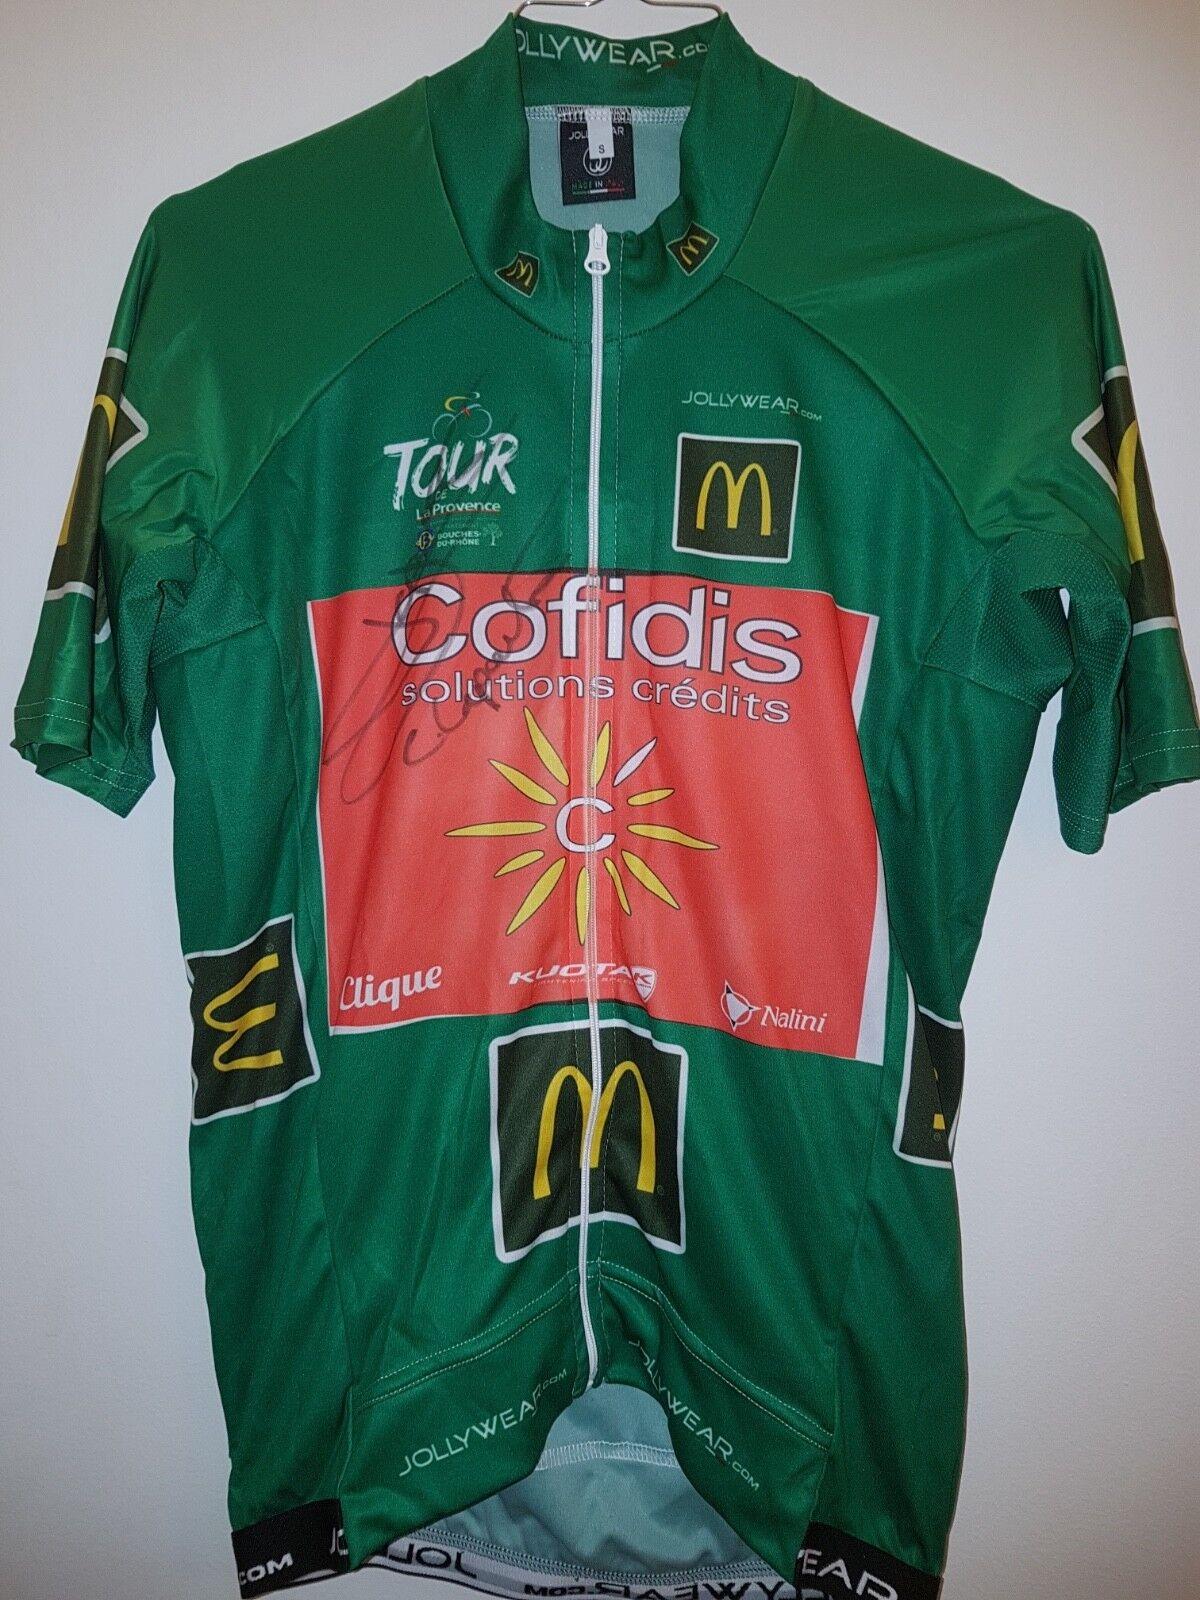 Maillot cycliste LAPORTE COFIDIS tour jersey de france cycling jersey tour radtrikot 3257f2